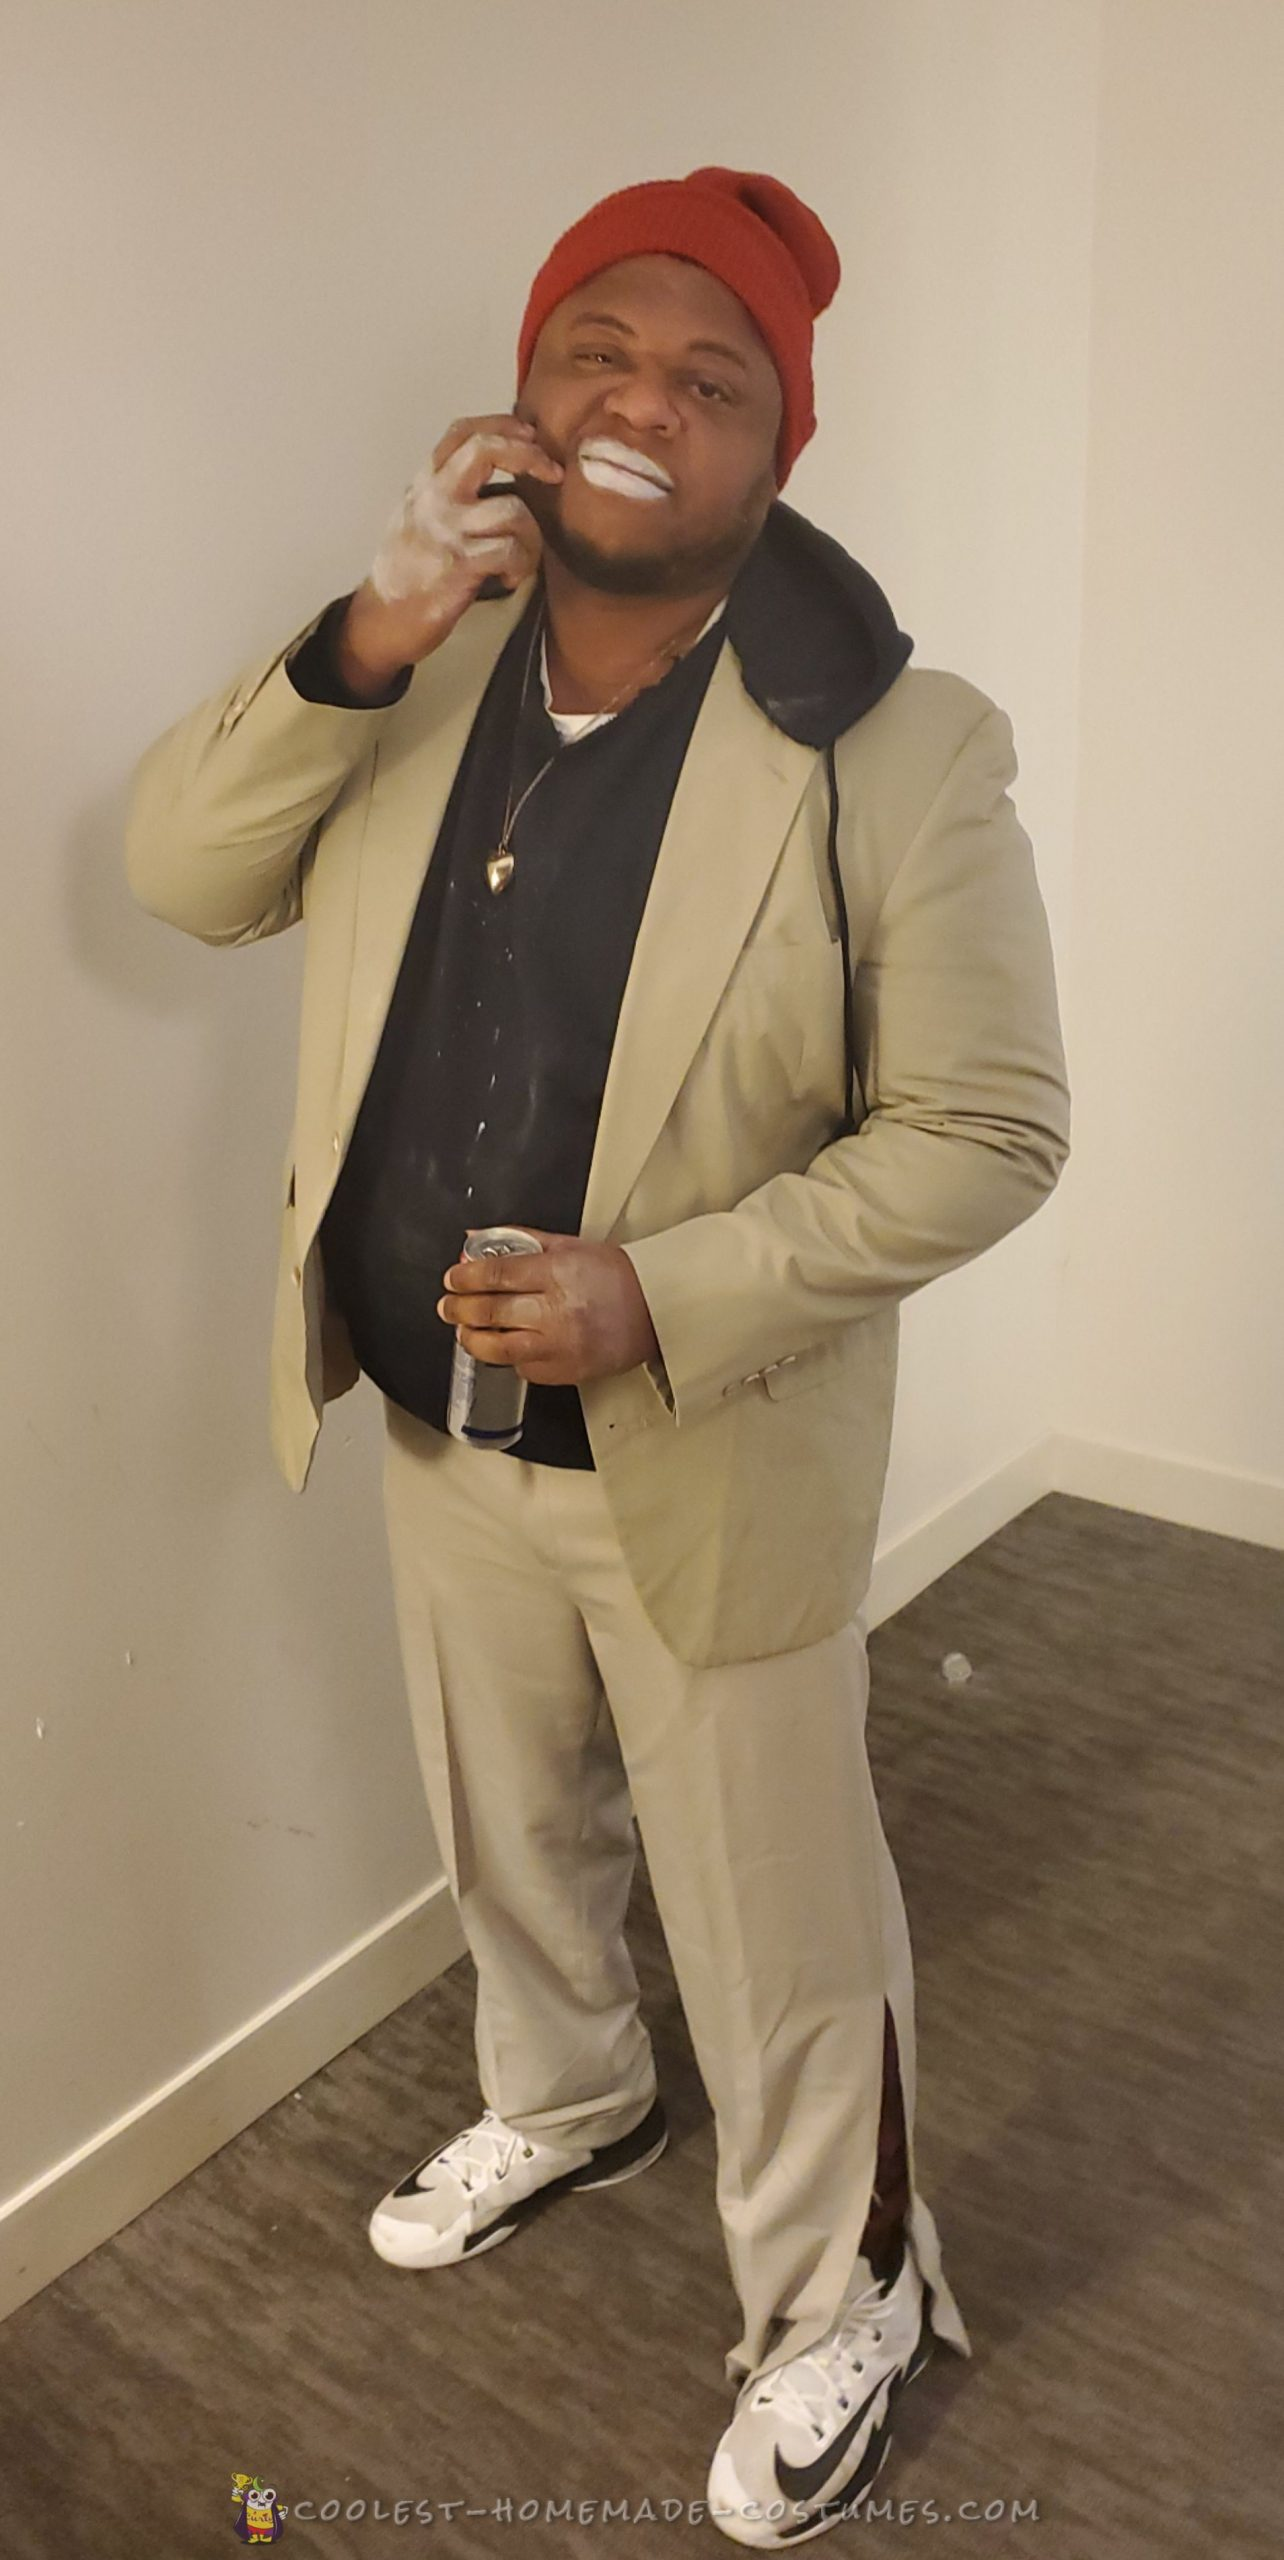 Tyrone Biggums for adults